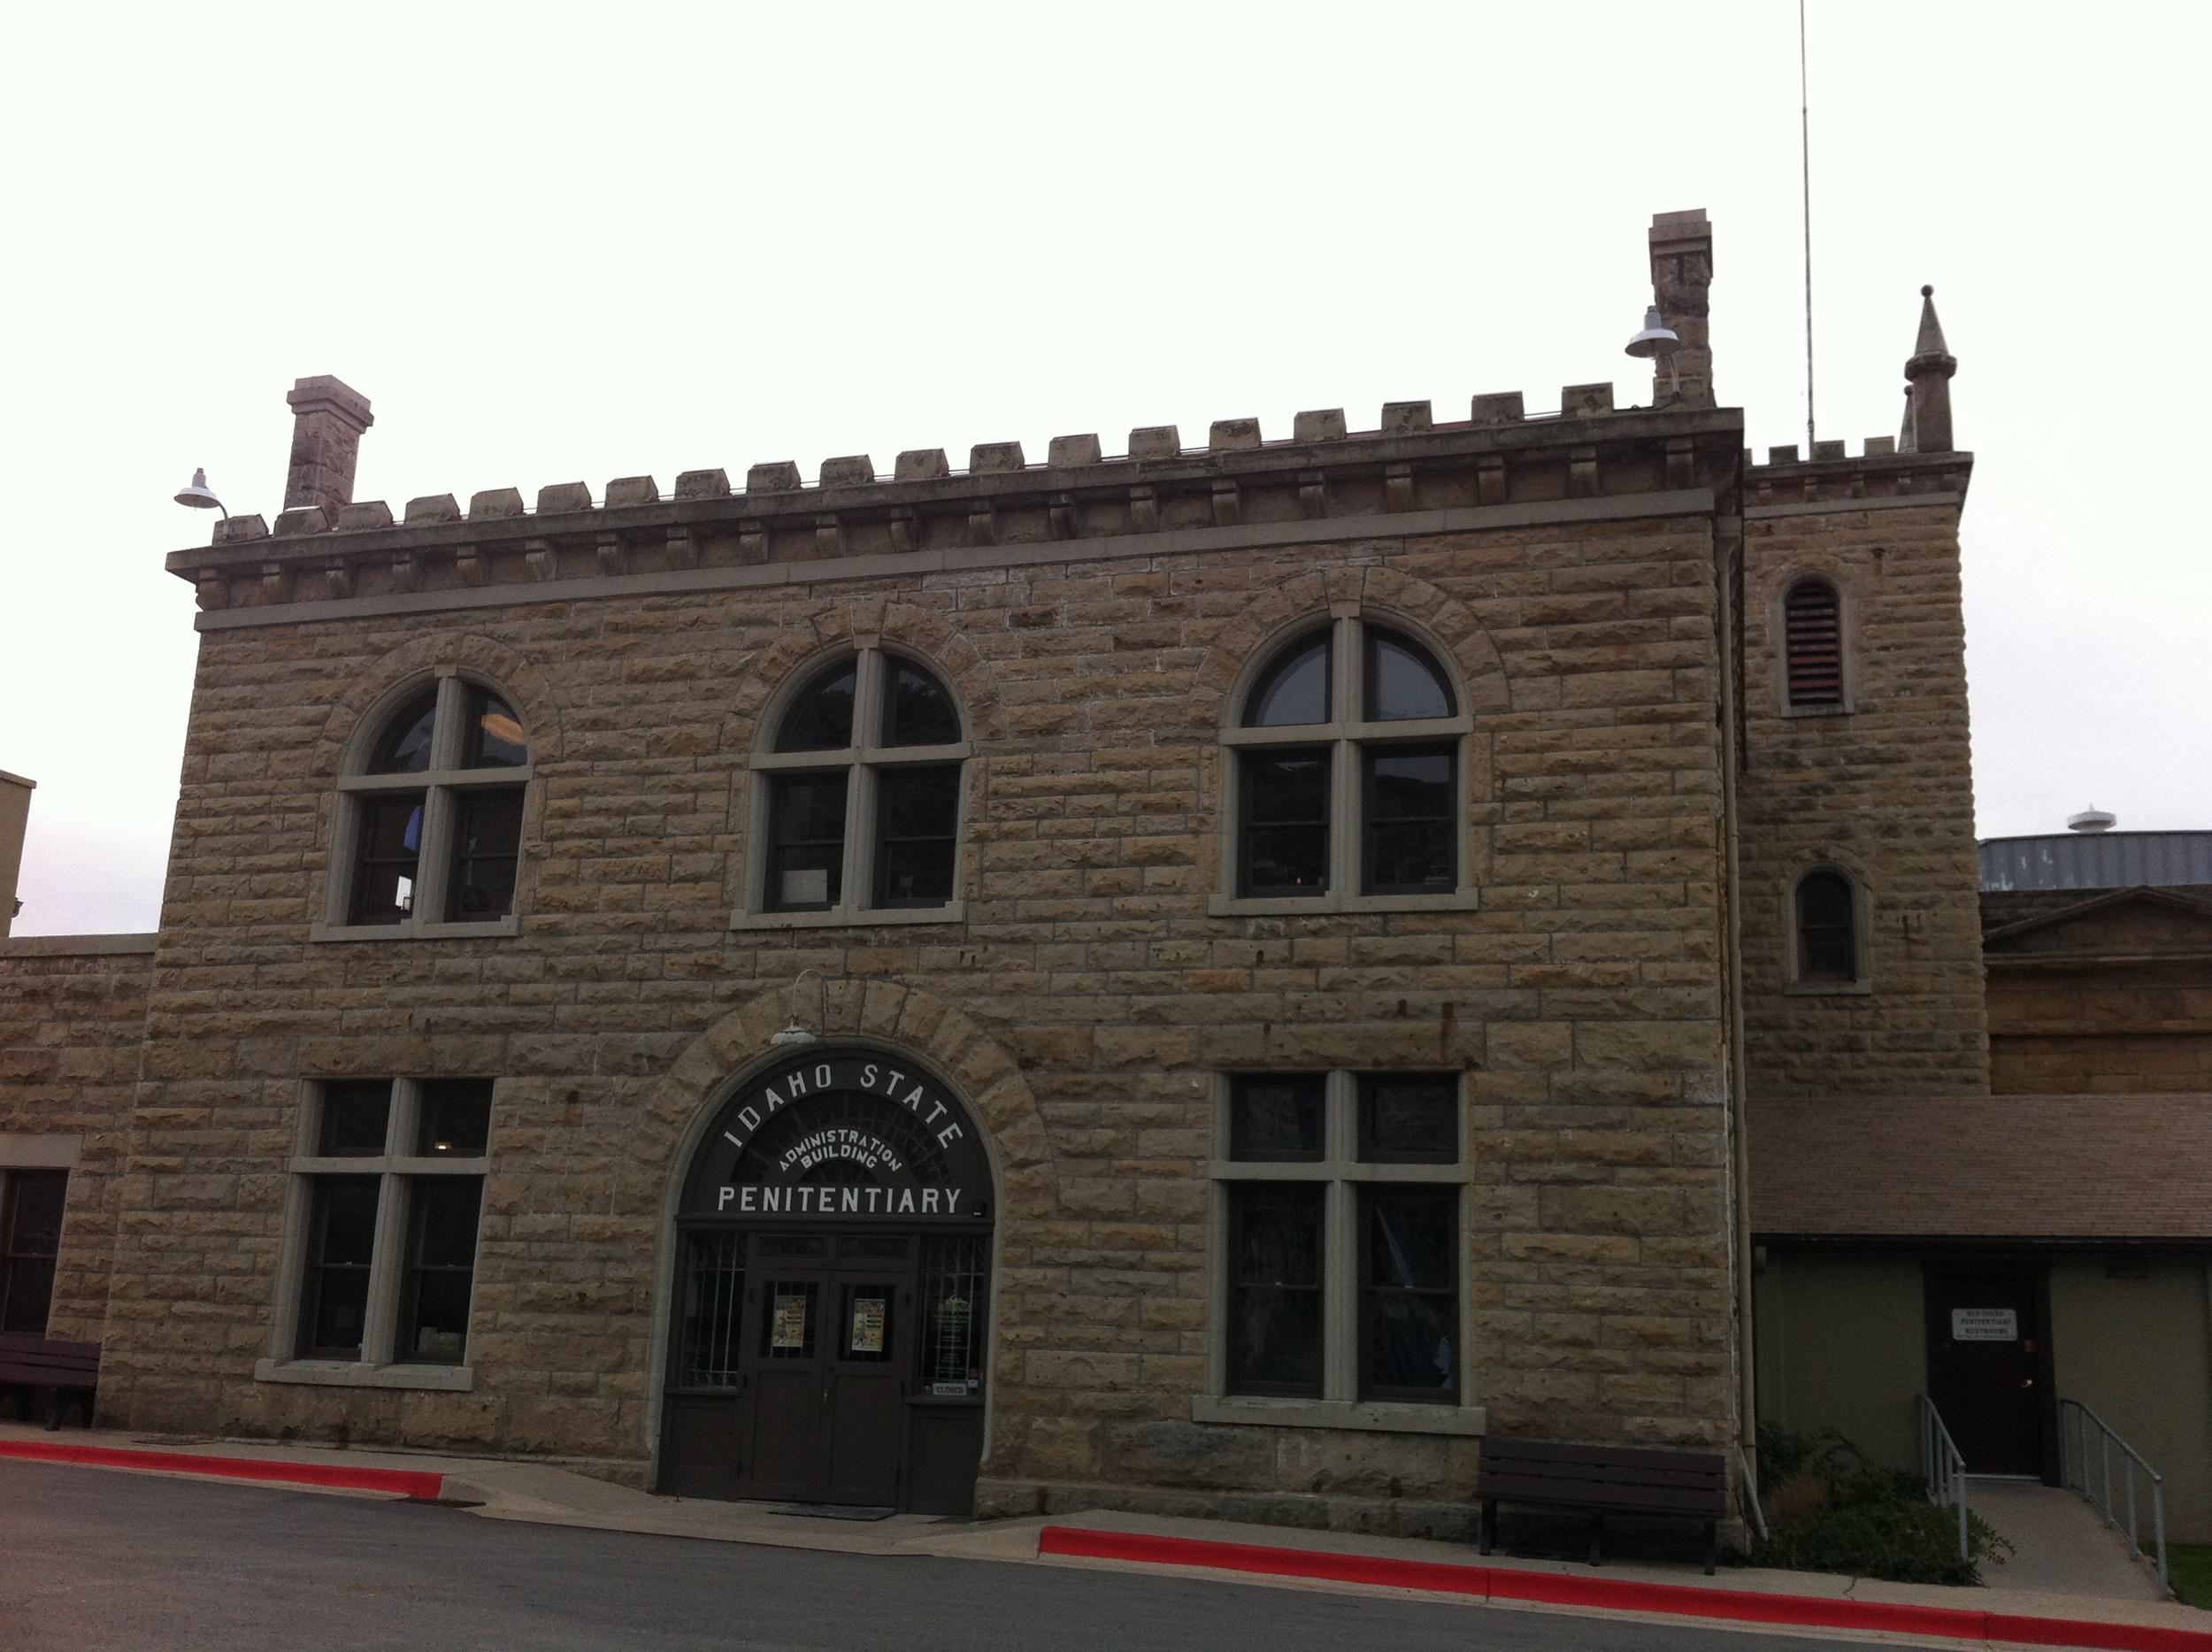 The Idaho State Penitentiary seem charming in comparison to Kilmainham Gaol.